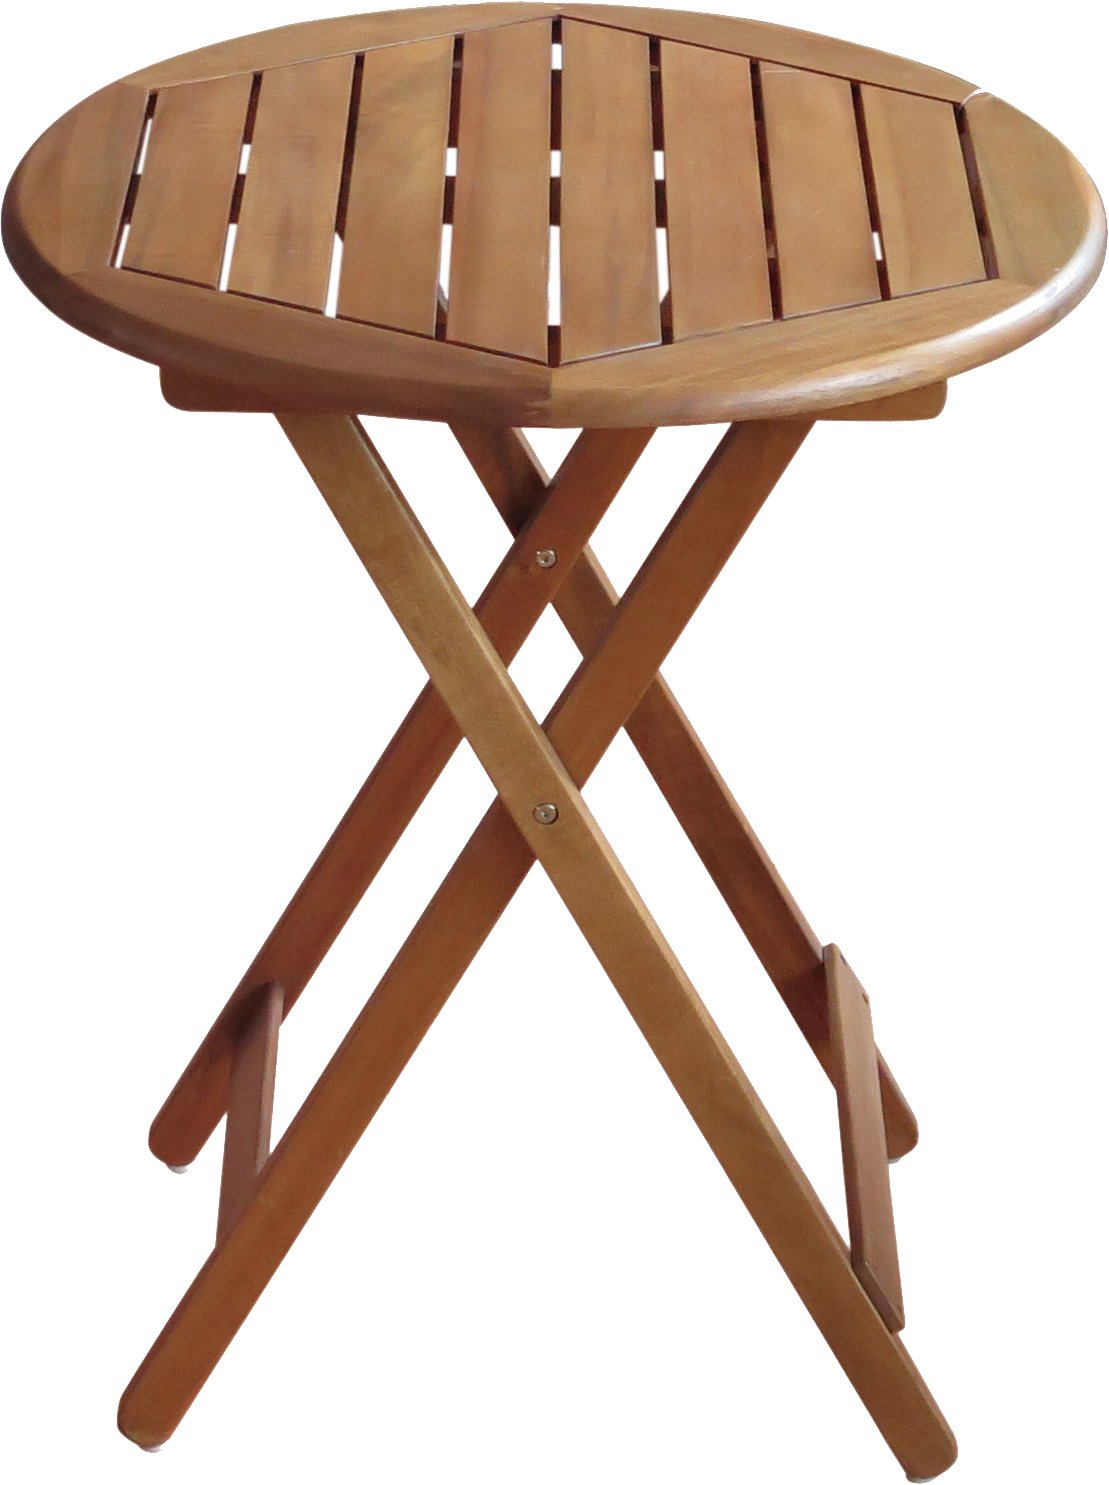 Top tables de jardin selon les notes - Amazon table de jardin ...